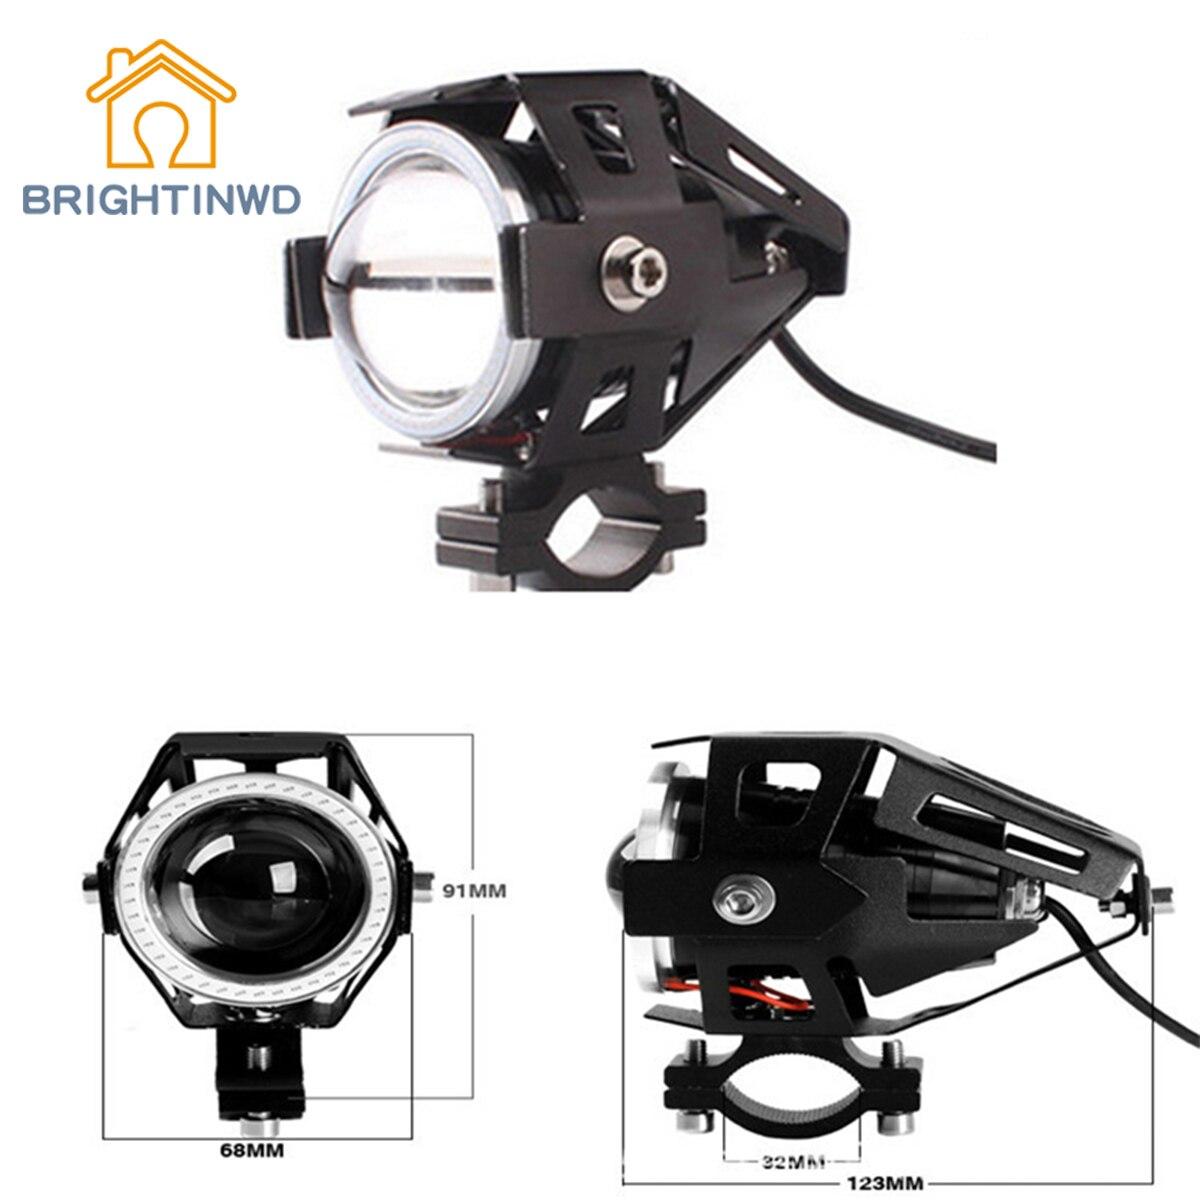 BRIGHTINWD Car LED Headlight U7 Transformers Electric Laser Cannon Modified Flash Spotlight Highlighted dy6020 20w car spotlight headlight